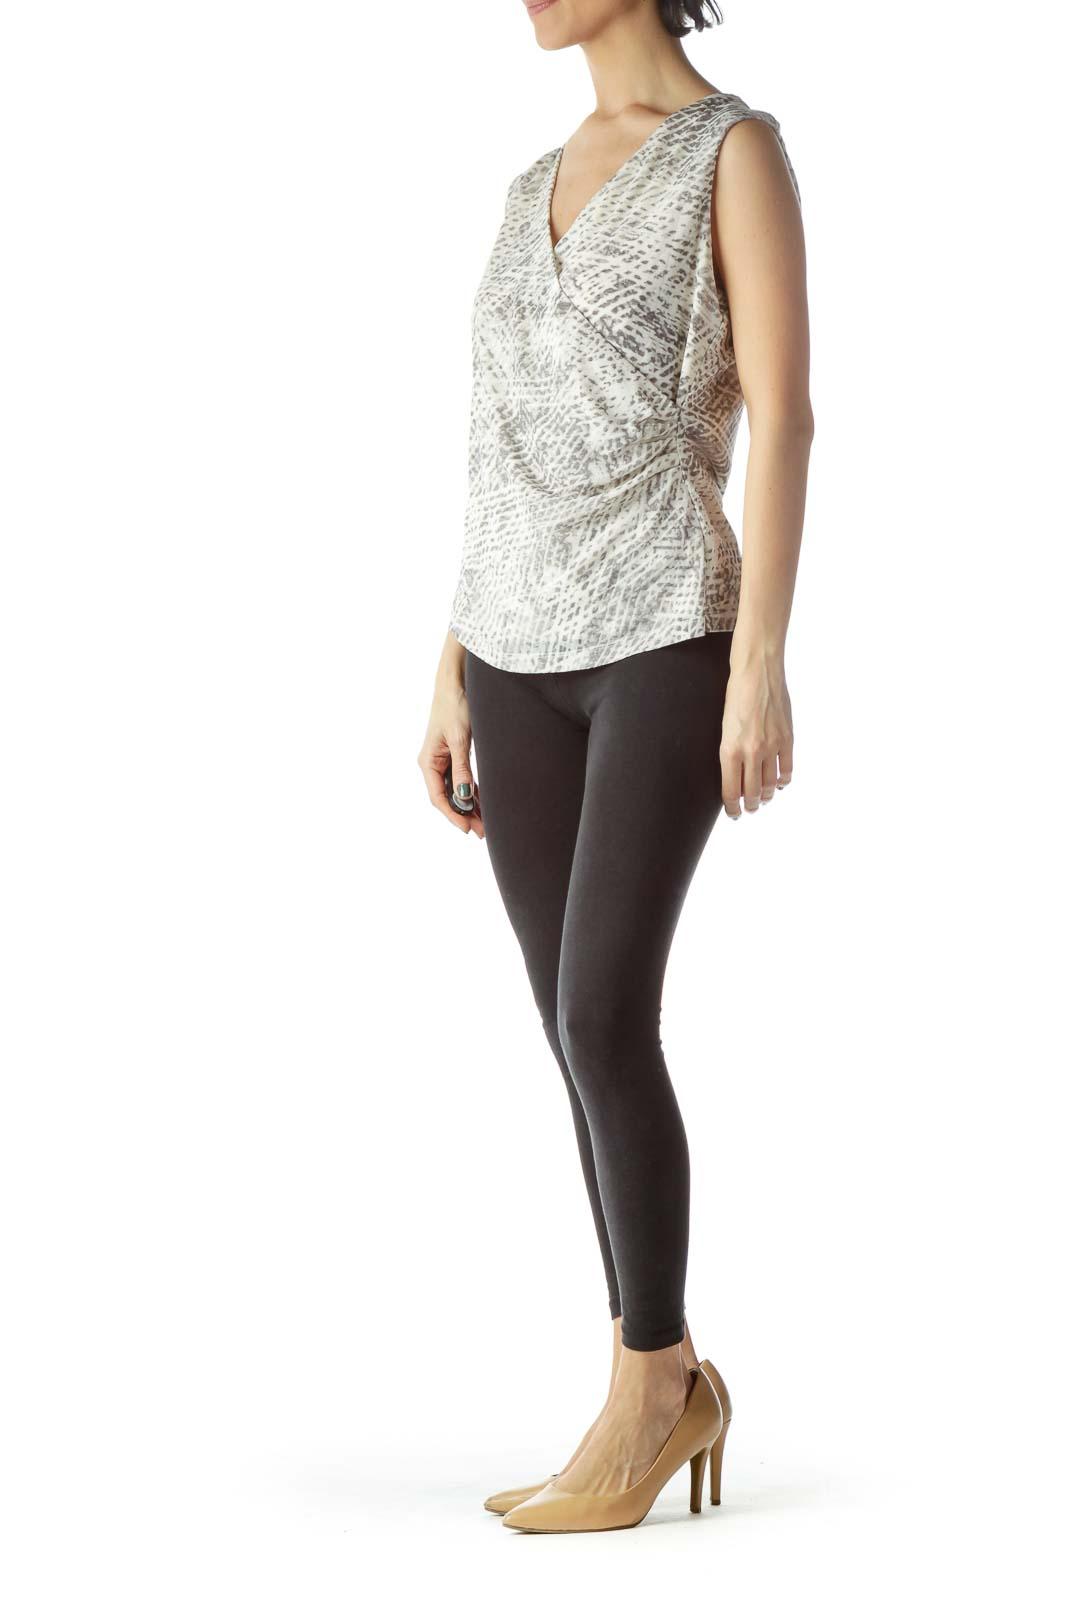 Gray Cream Snakeskin Print Sleeveless Top